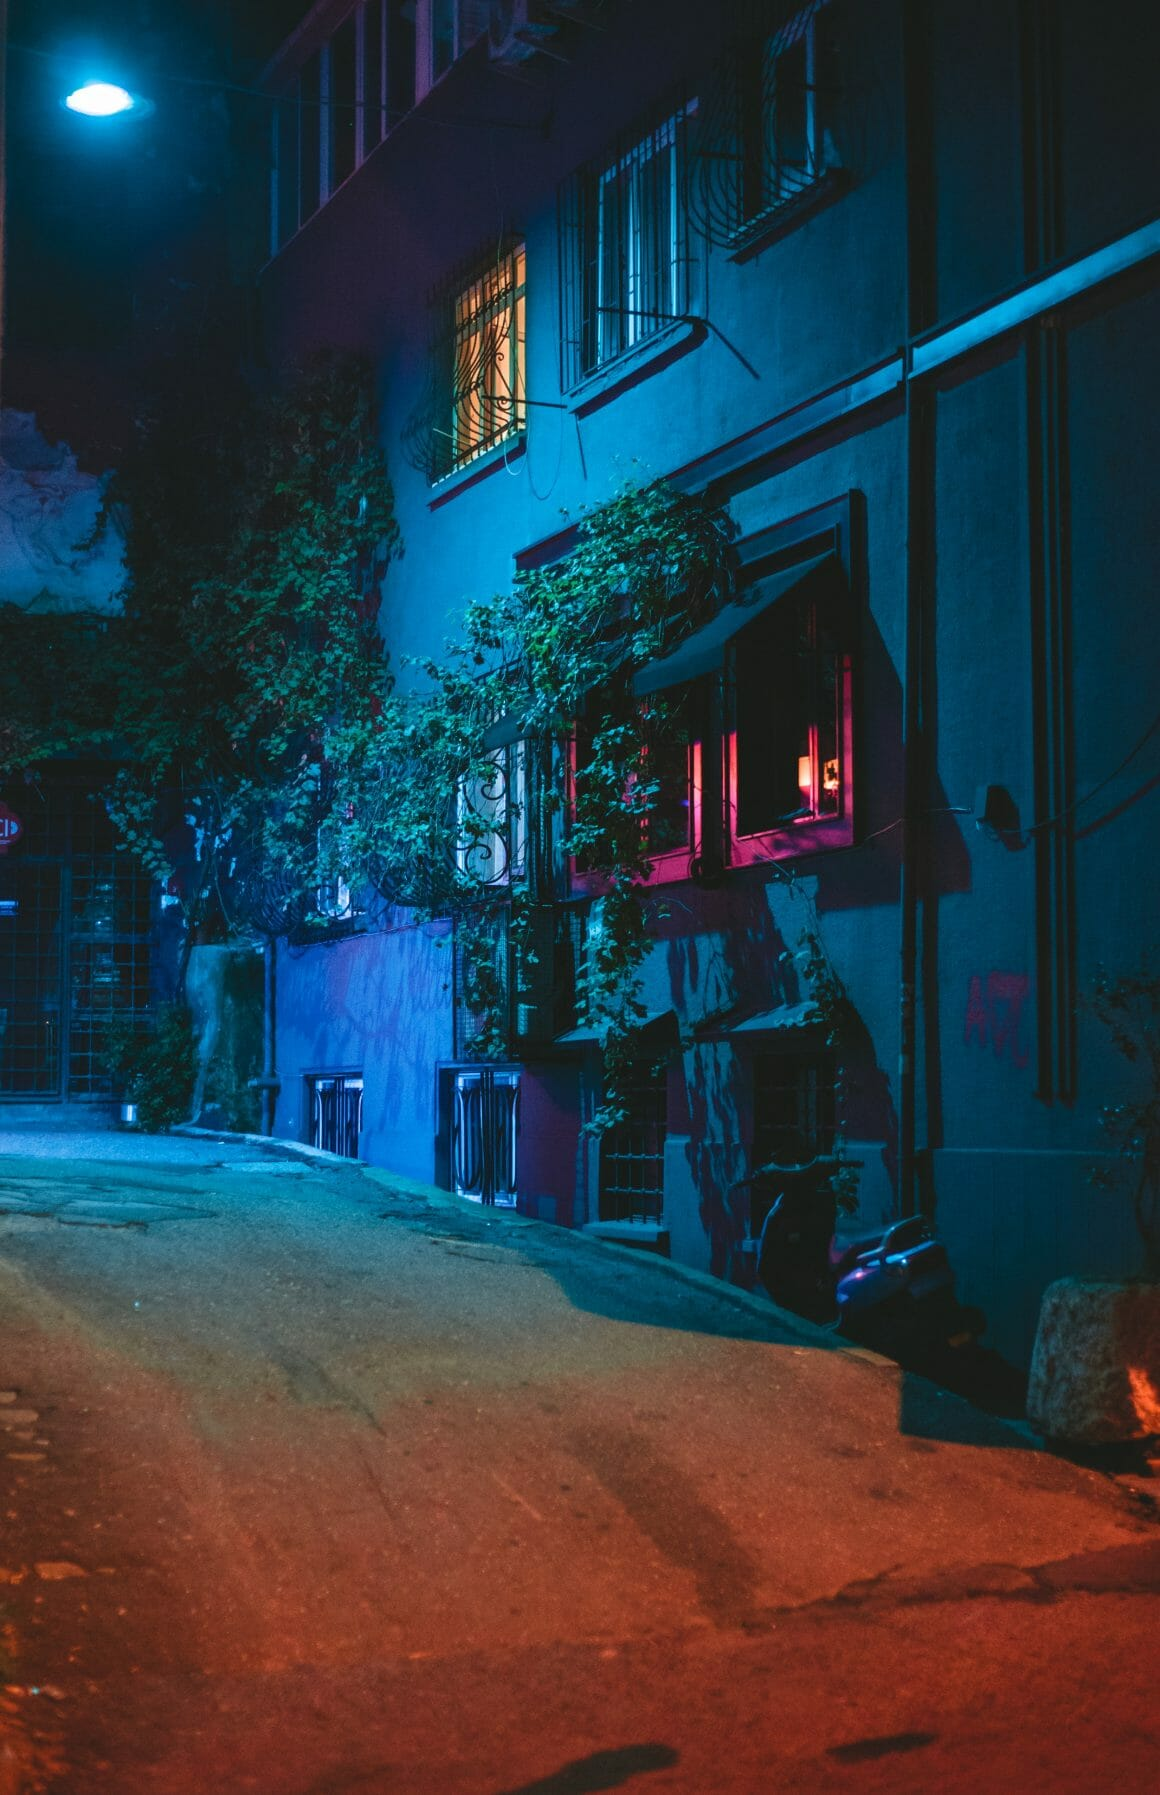 """I Got Lost in Istanbul at Night"" ou les rêveries d'un promeneur solitaire par Hamza Benkirane 9"